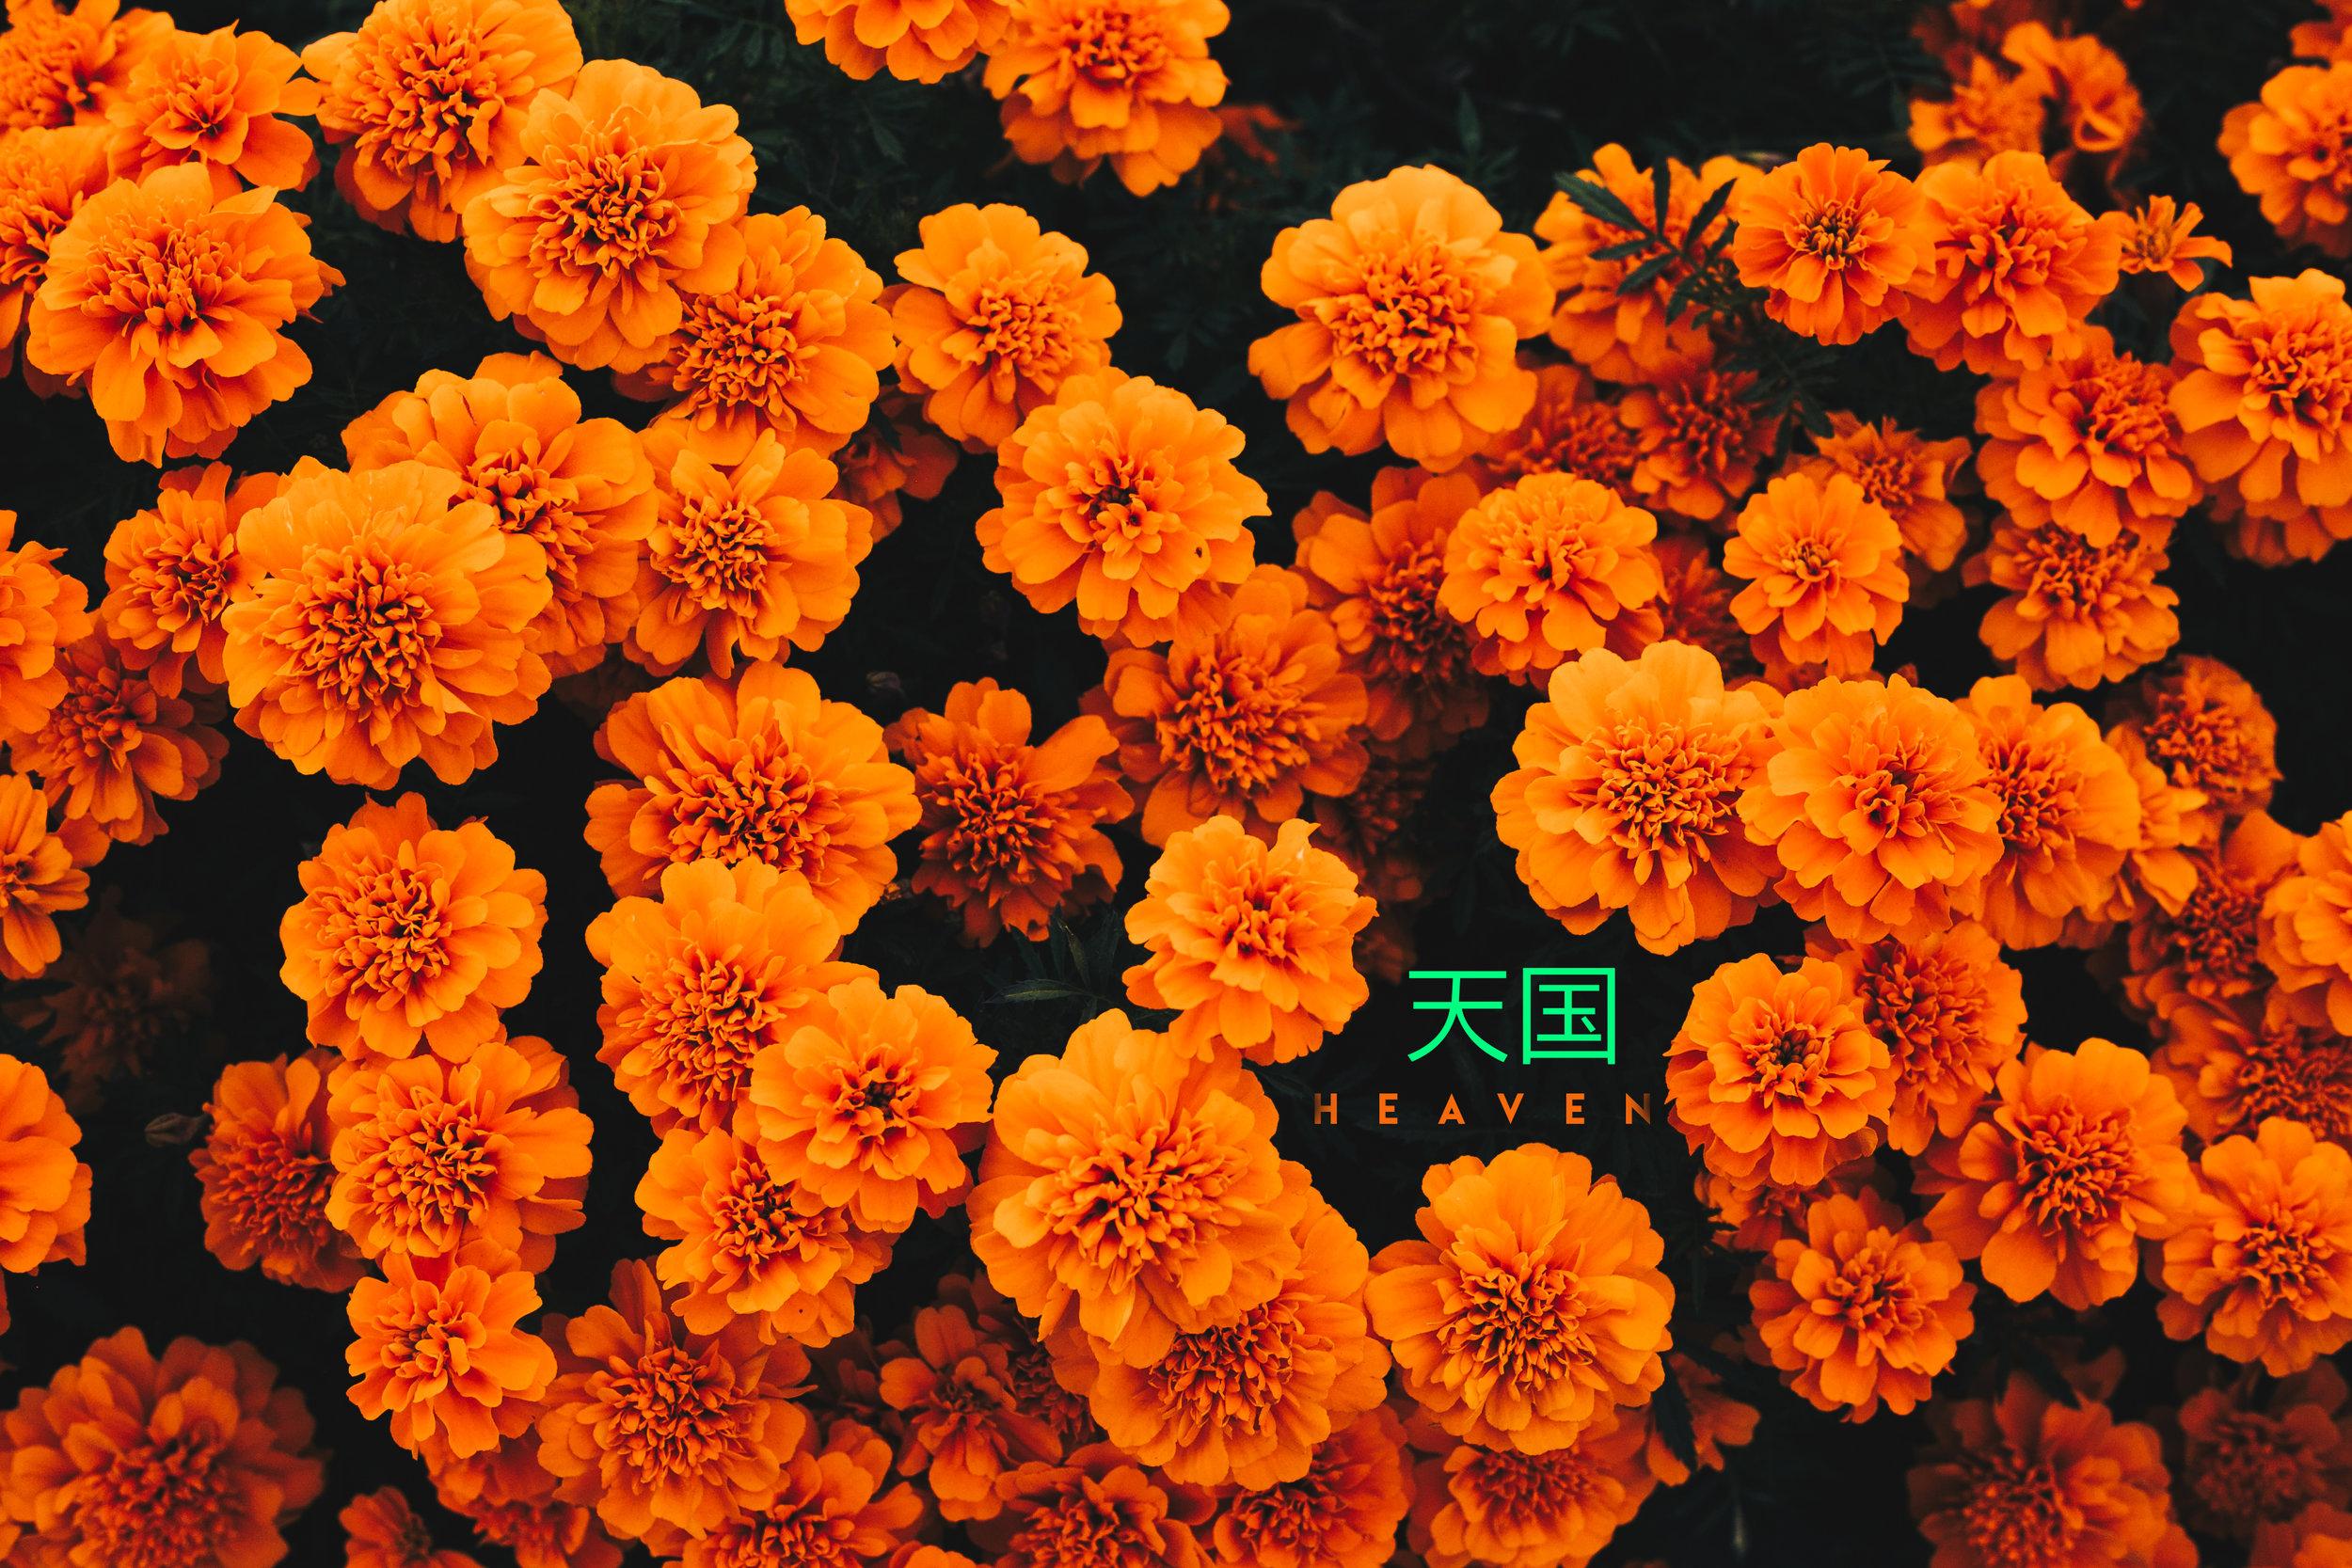 CynLagos-Japan-Teaser-Hakone-Oct-2018 (18 of 34)-heaven.jpg